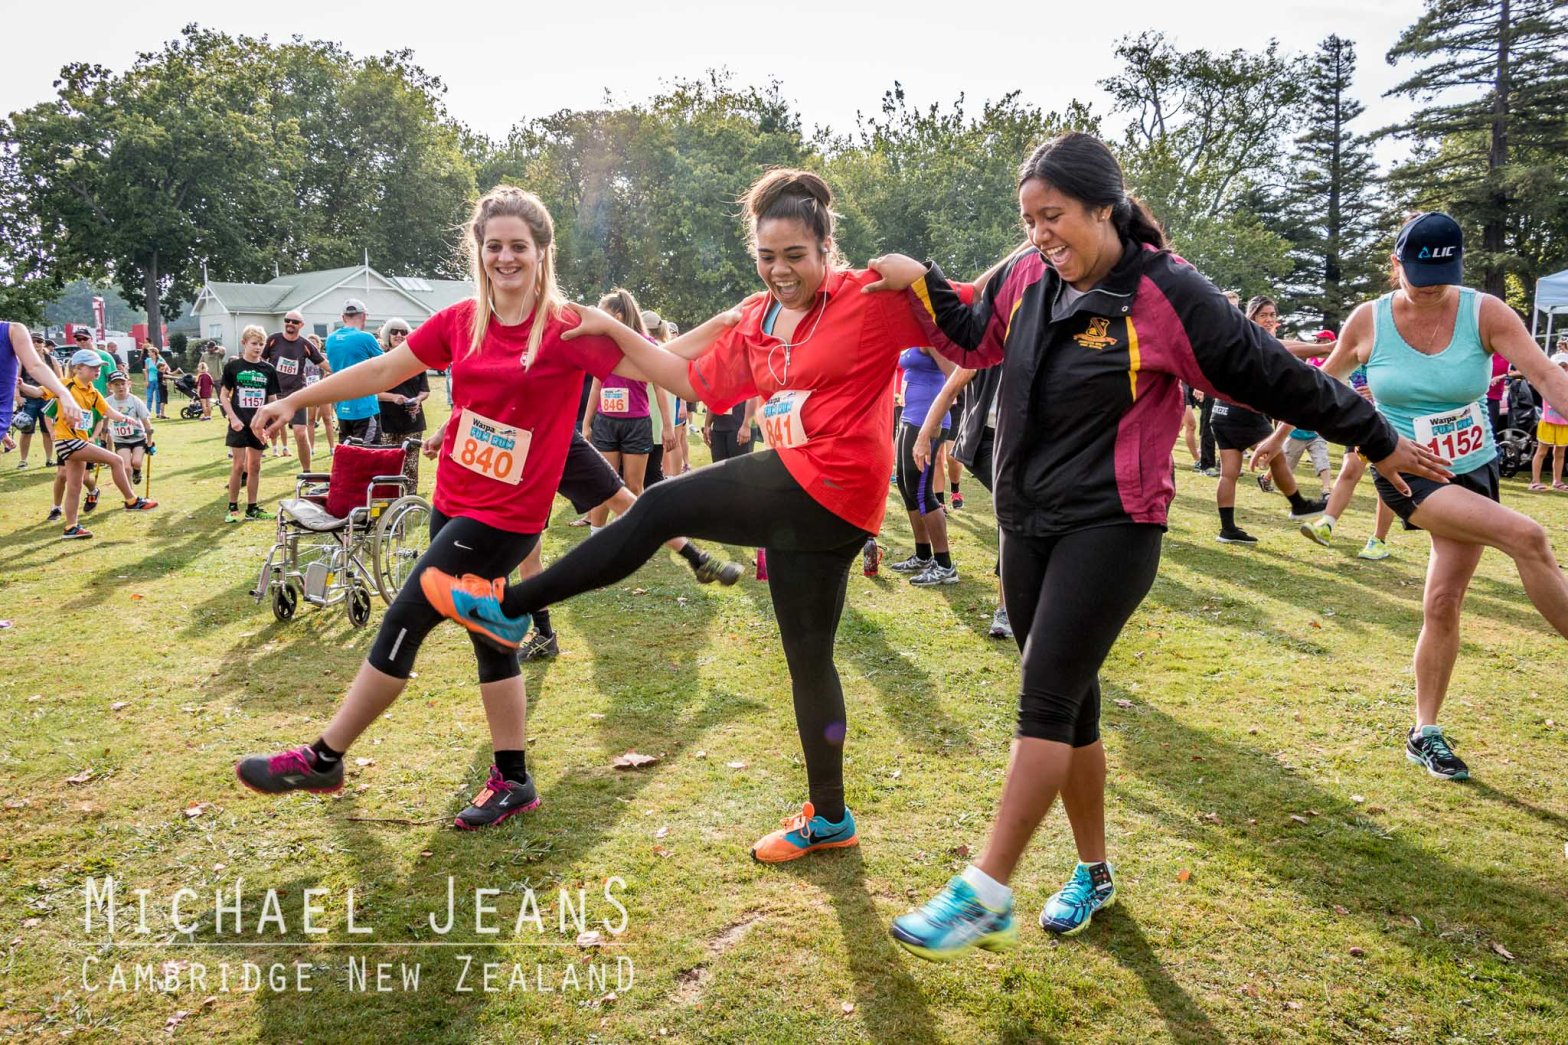 Waipa Fun Run 2015 Victoria Square Cambridge New Zealand